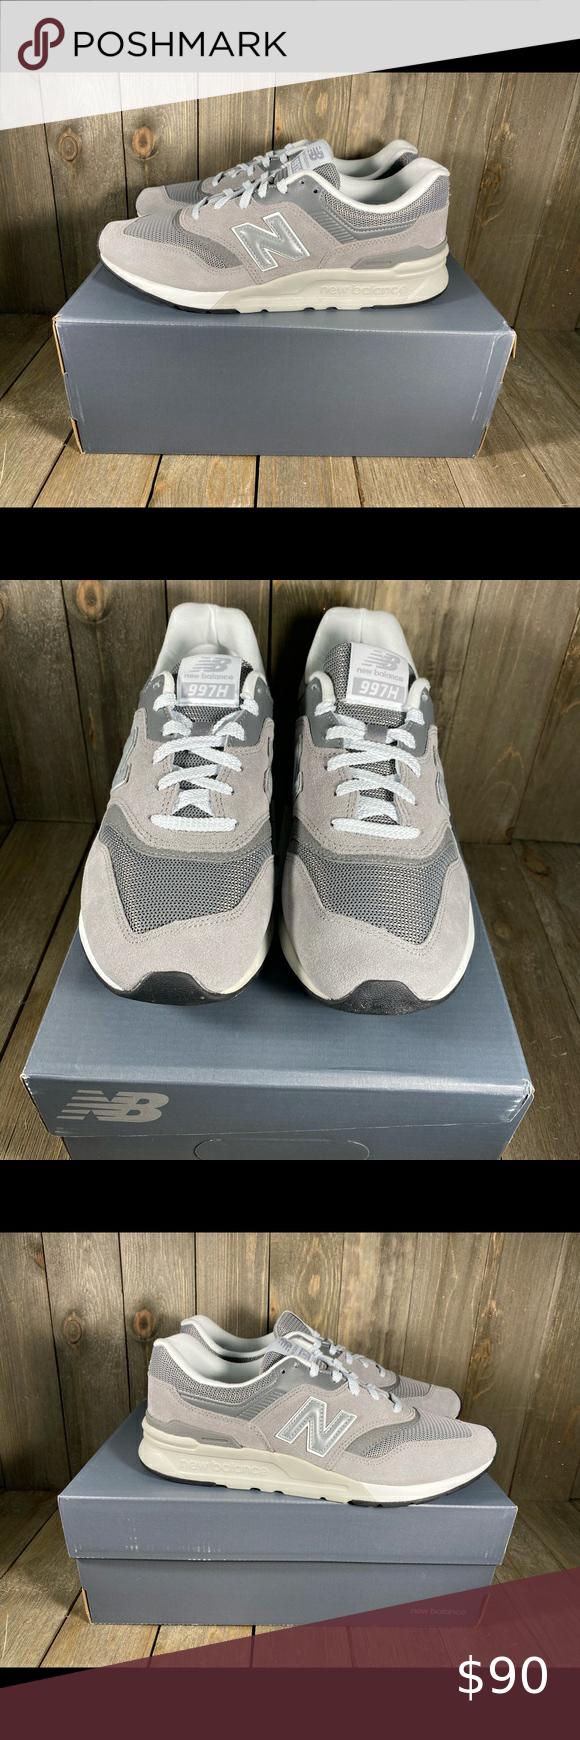 new balance cm997hca grey